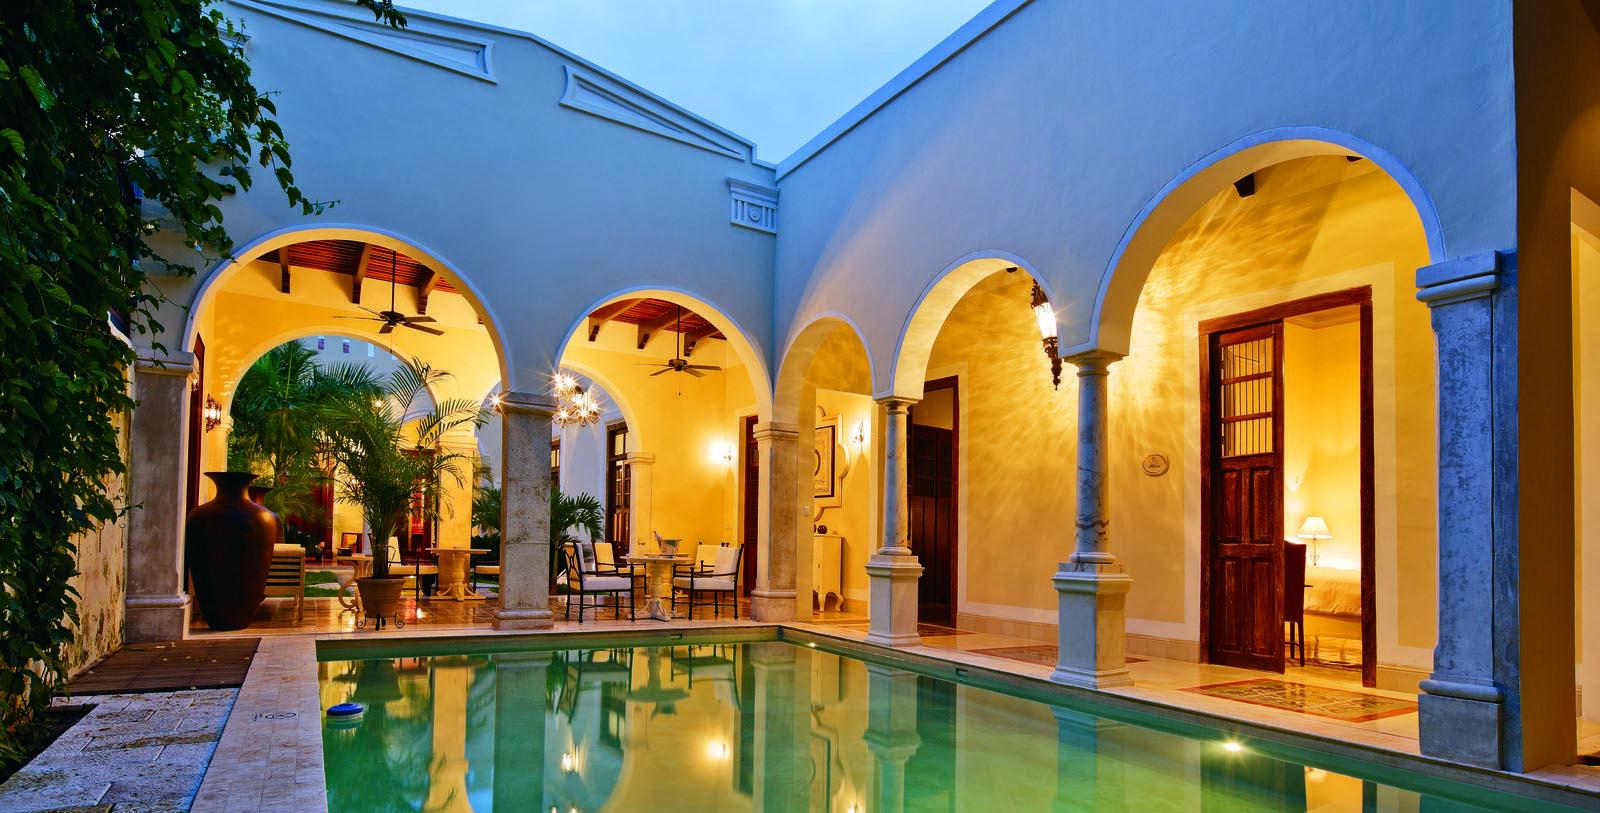 Image of outdoor courtyard Casa Lecanda, 1900s, Member of Historic Hotels Worldwide, in Merida, Mexico, Explore